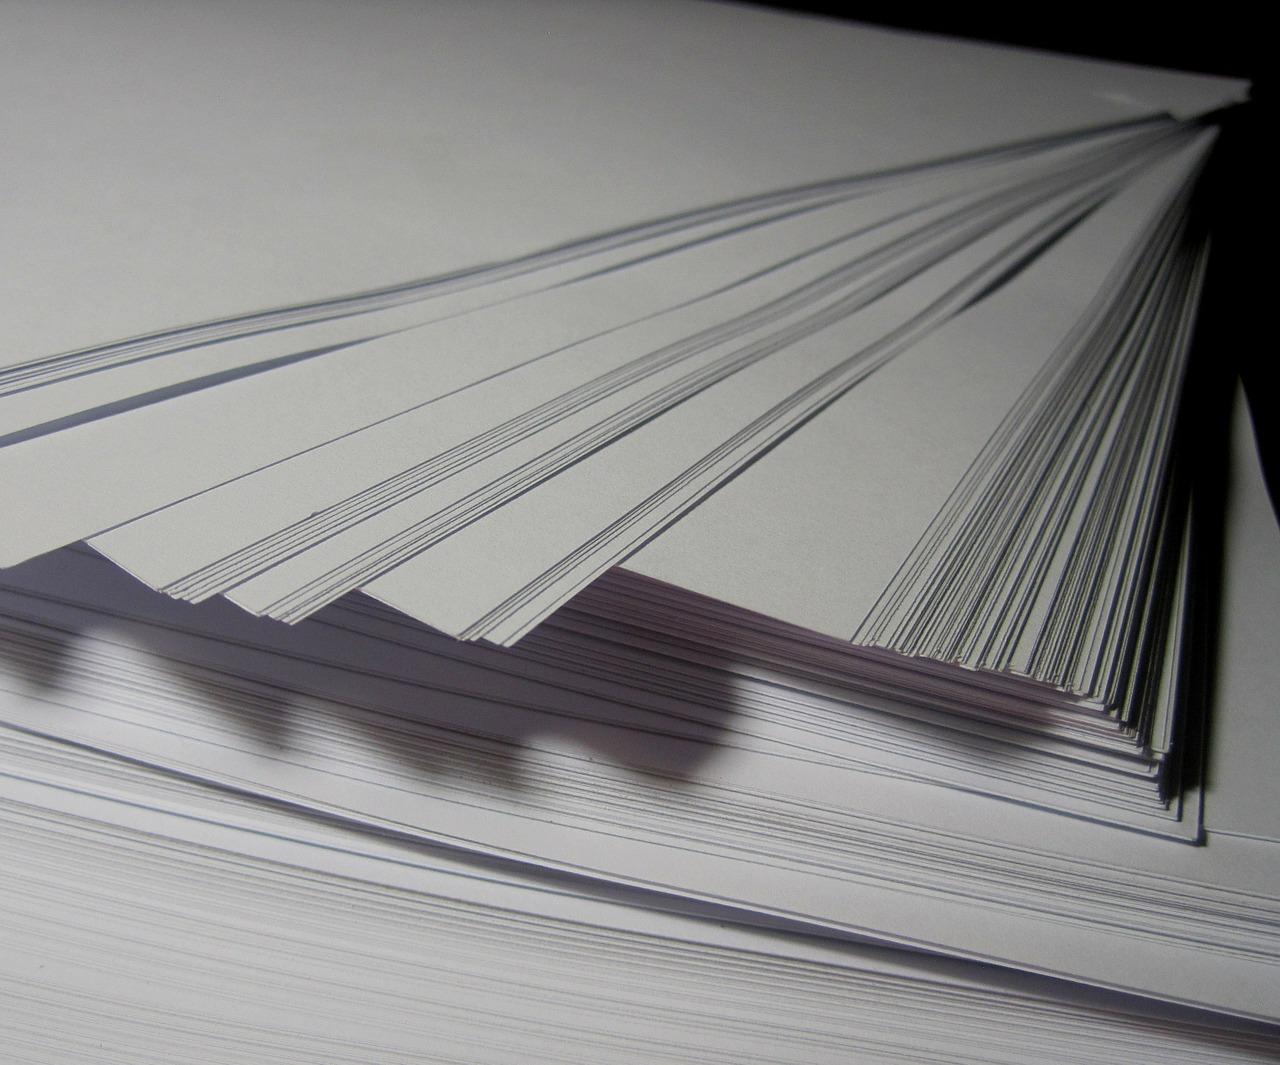 paper-224223_1280